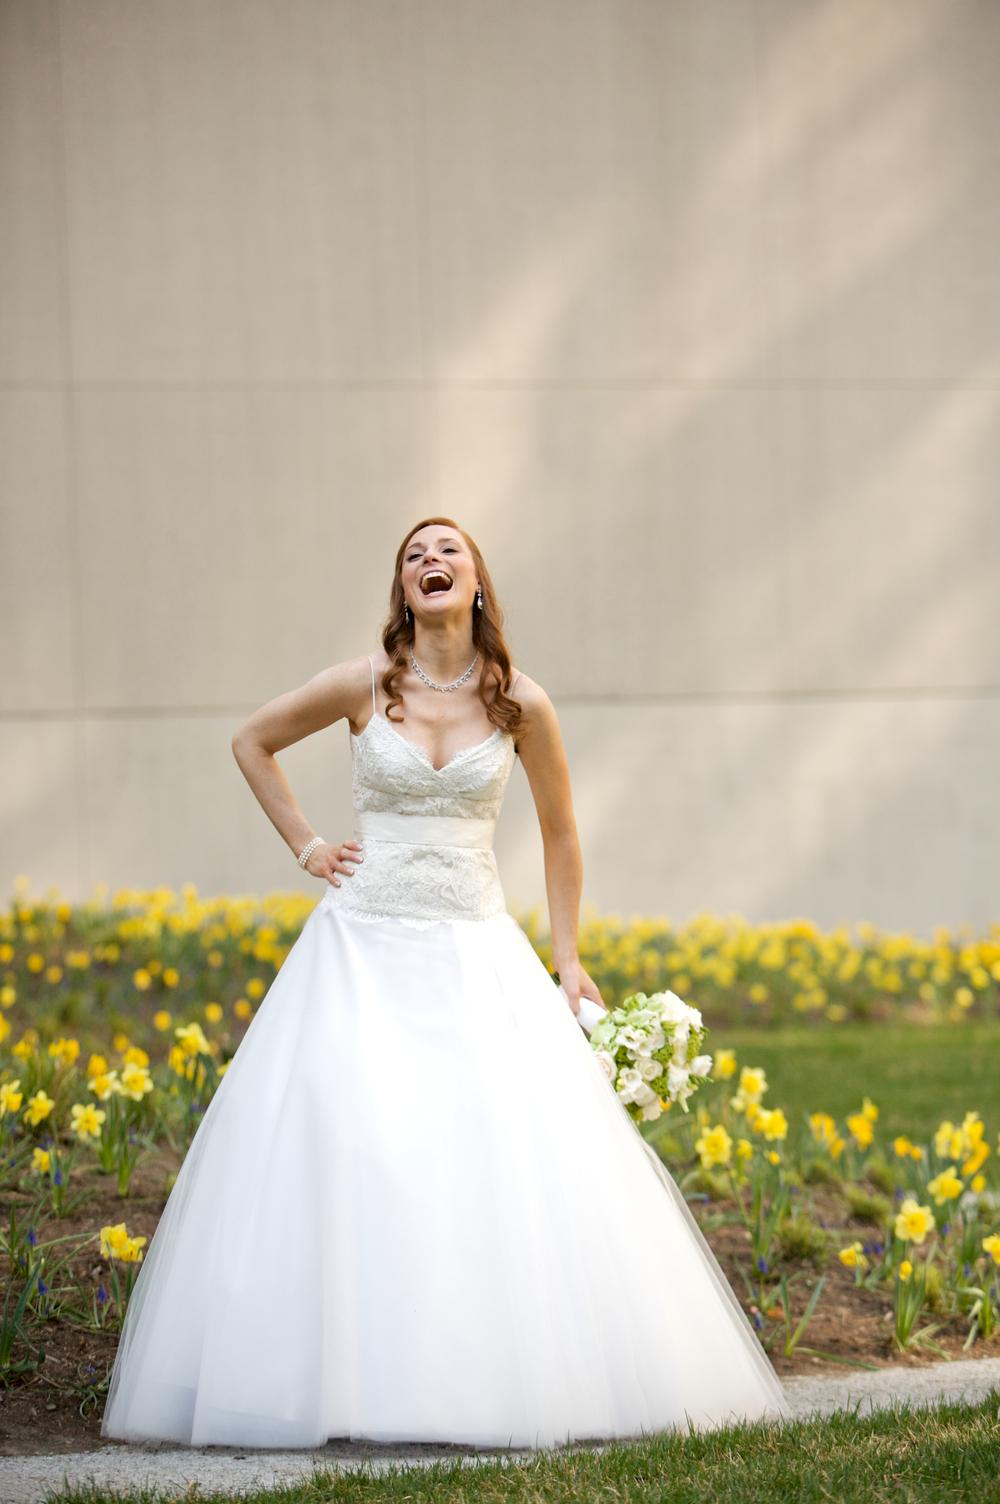 2010.04.10_Mautner-Budin_Wedding